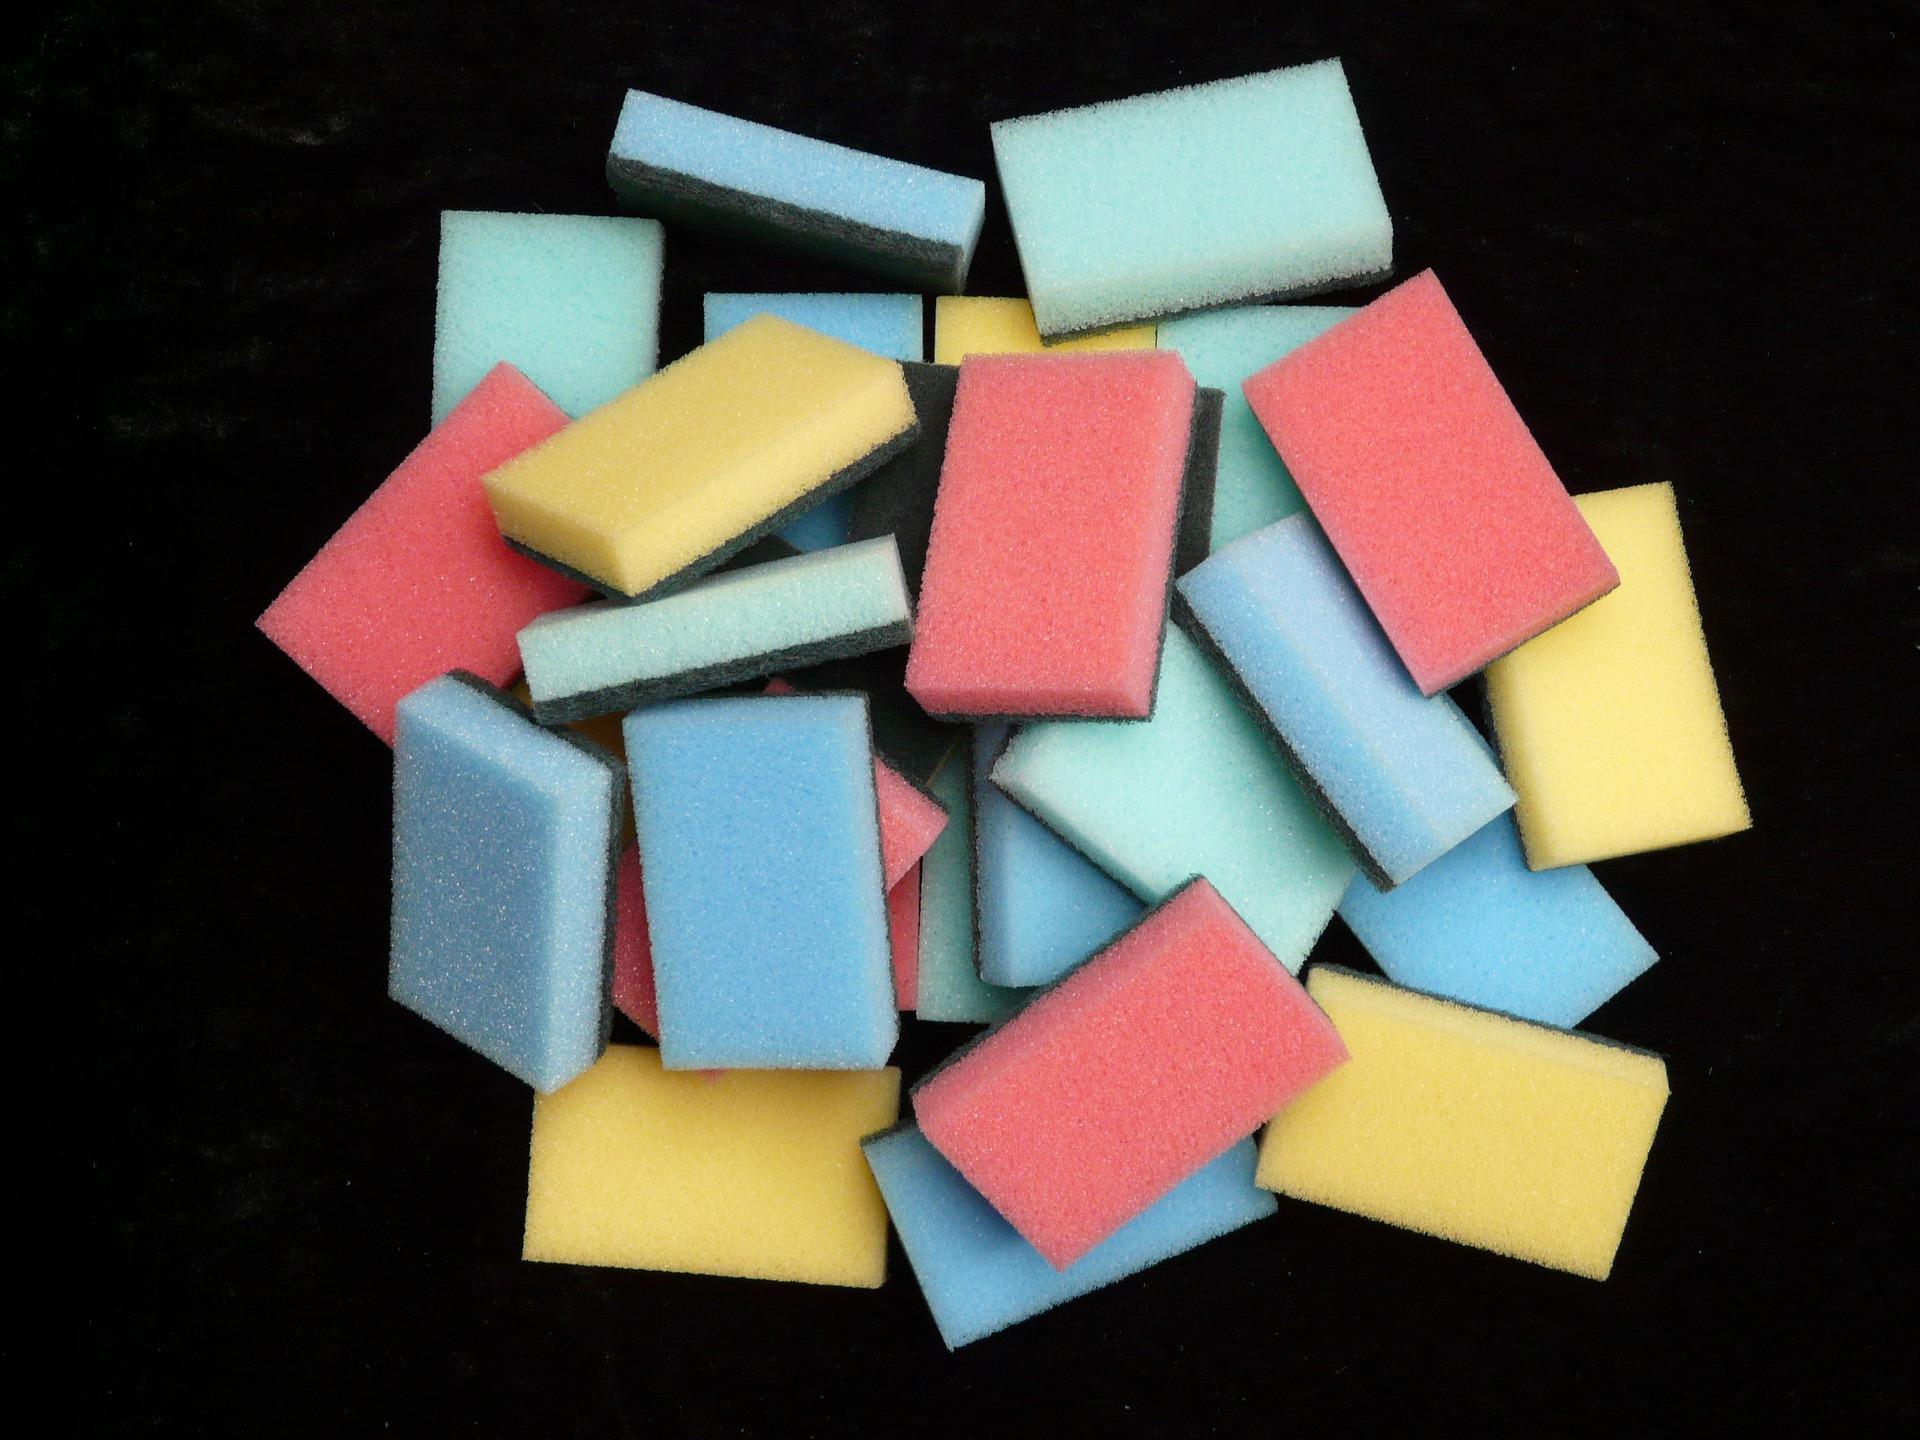 sponge-52115_1920 (1)